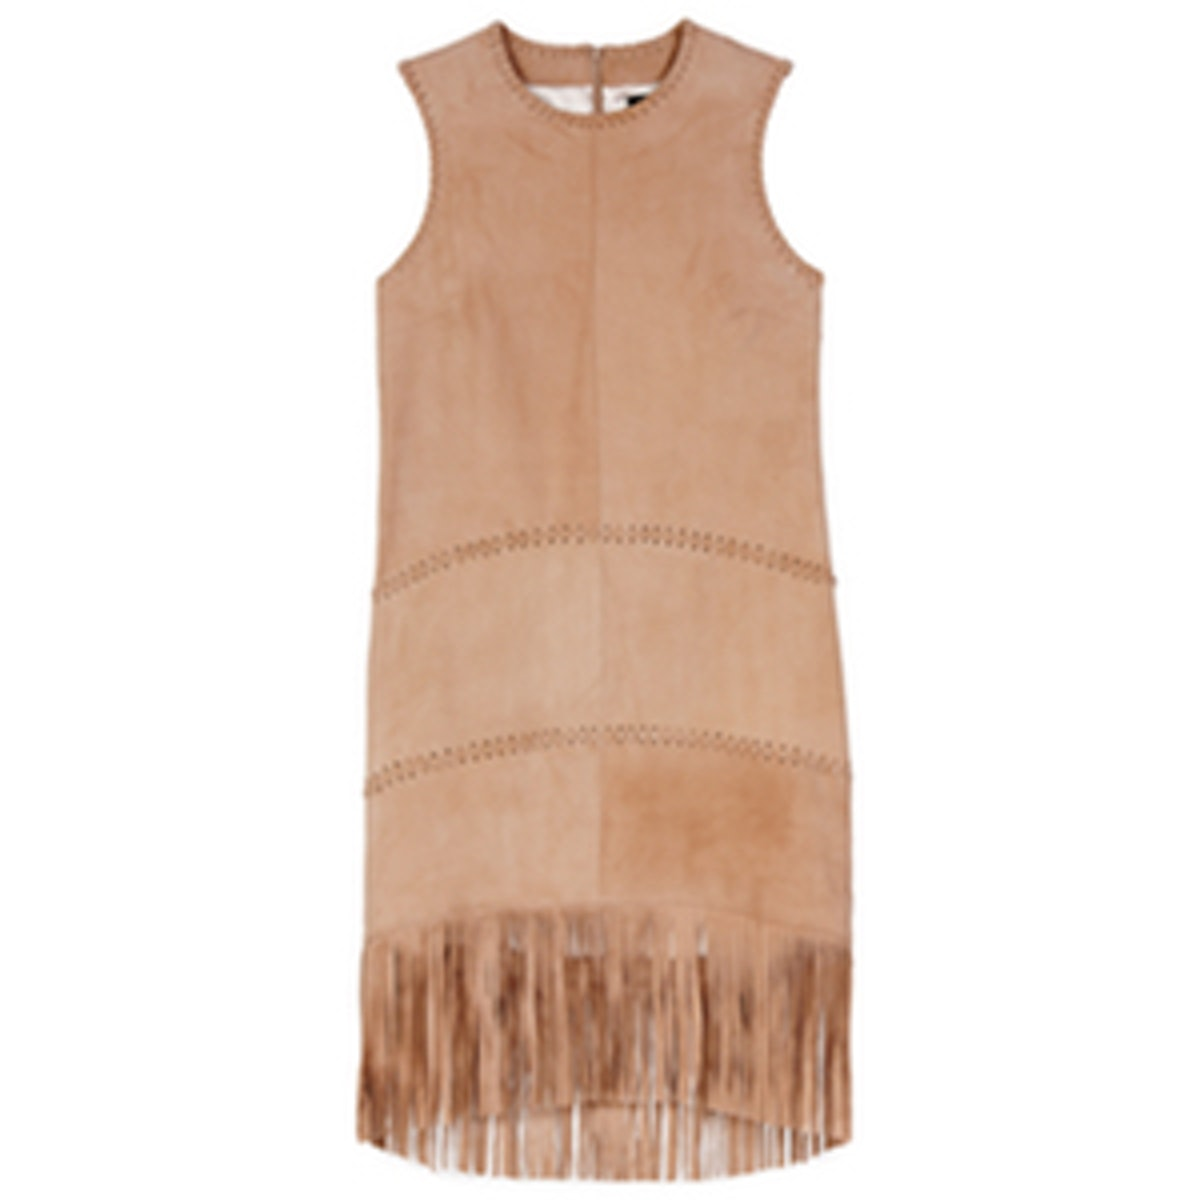 Celia Suede Fringe Dress